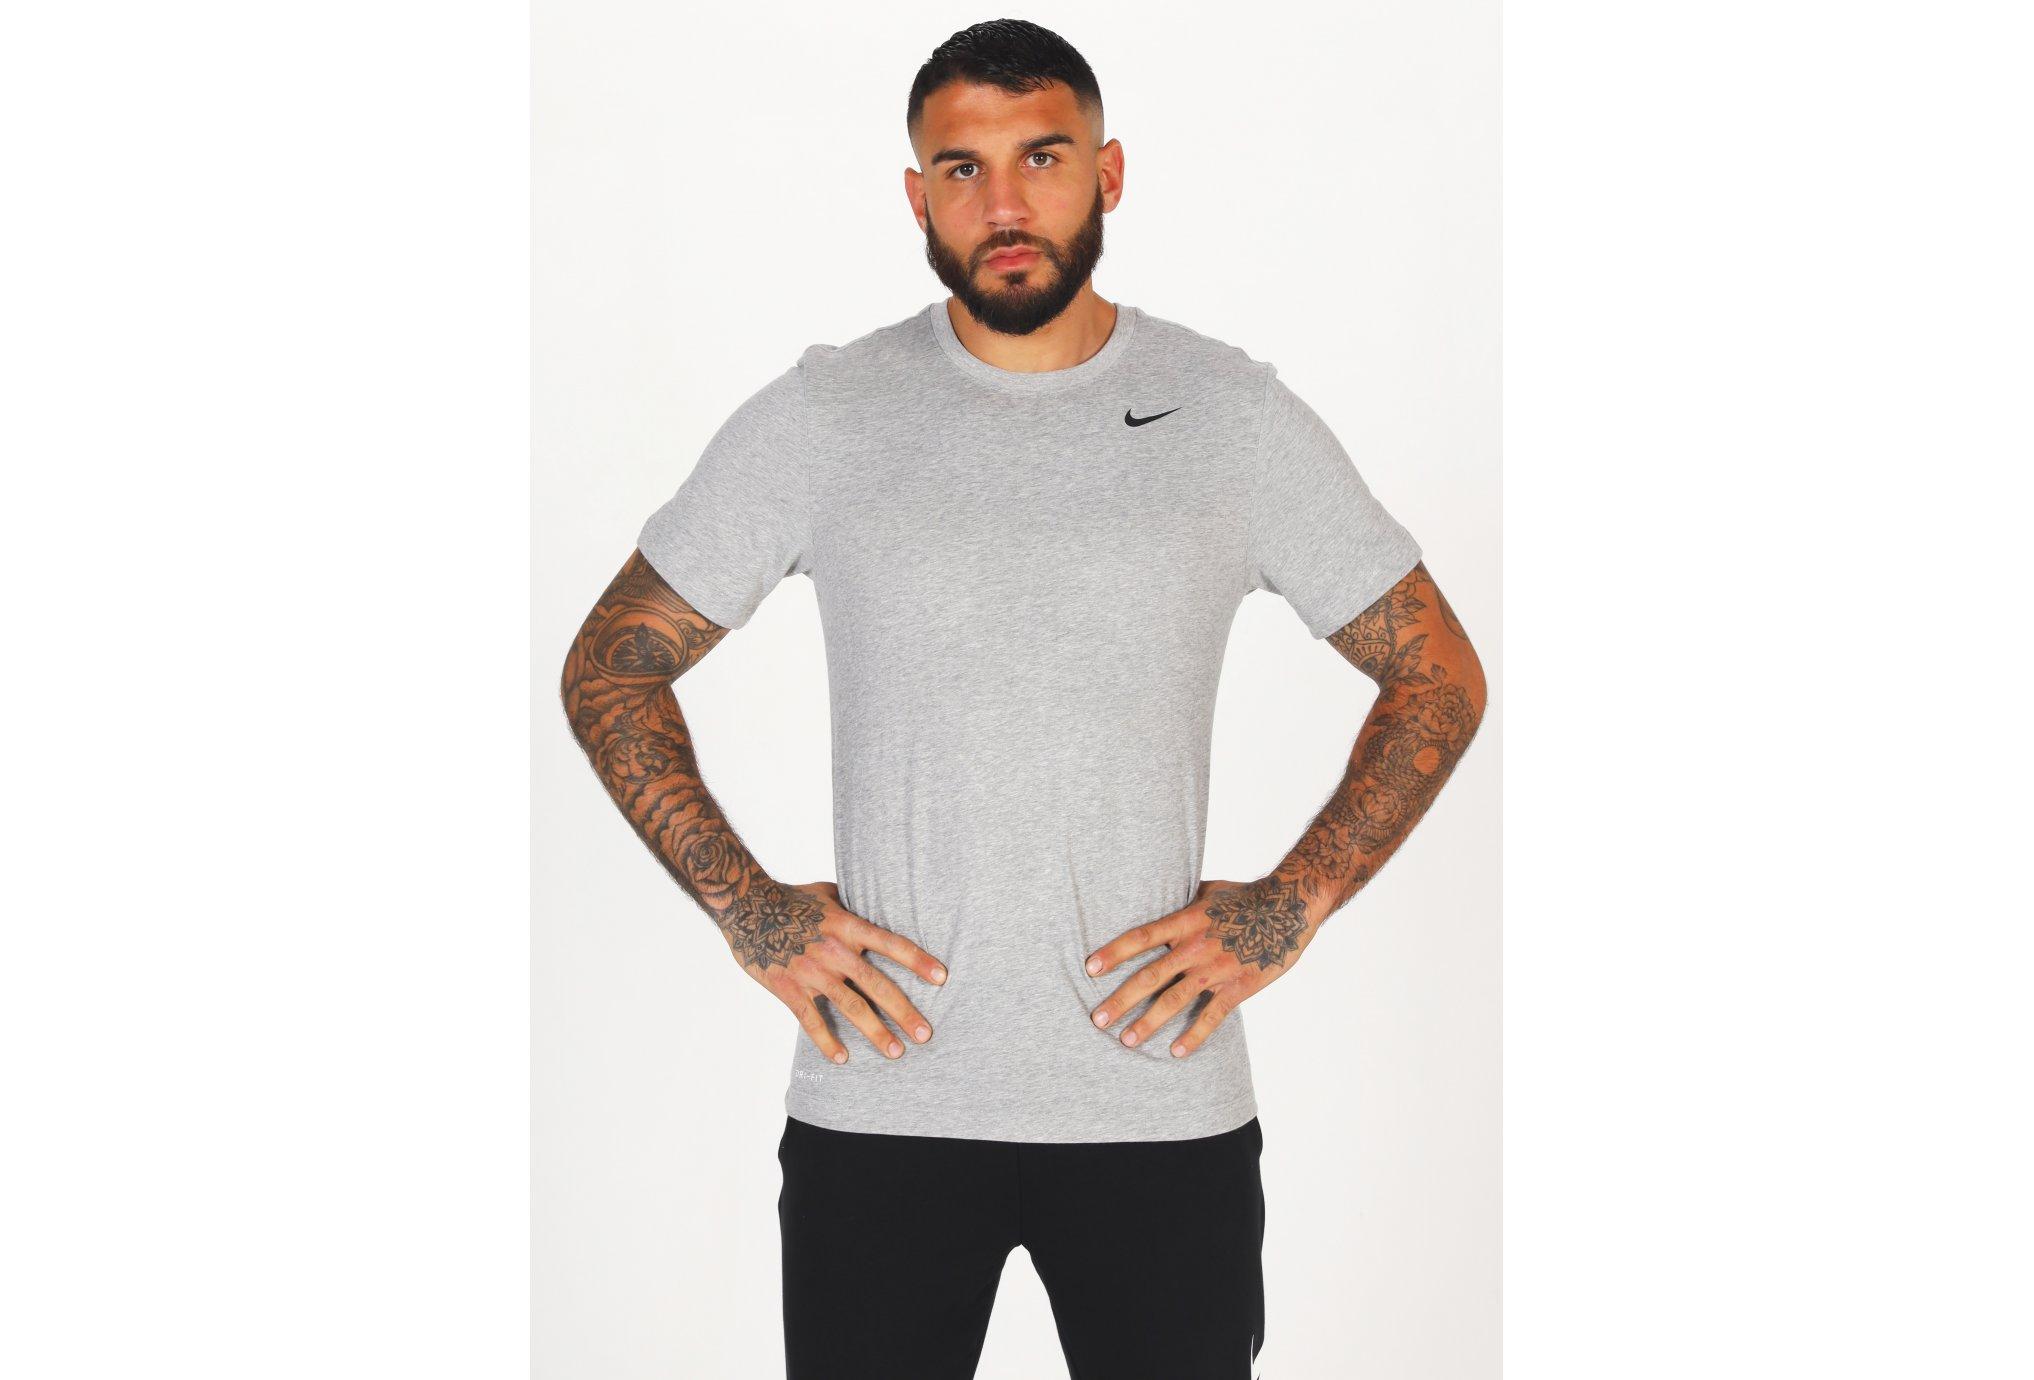 Nike Dfc Block Solid Crew M vêtement running homme